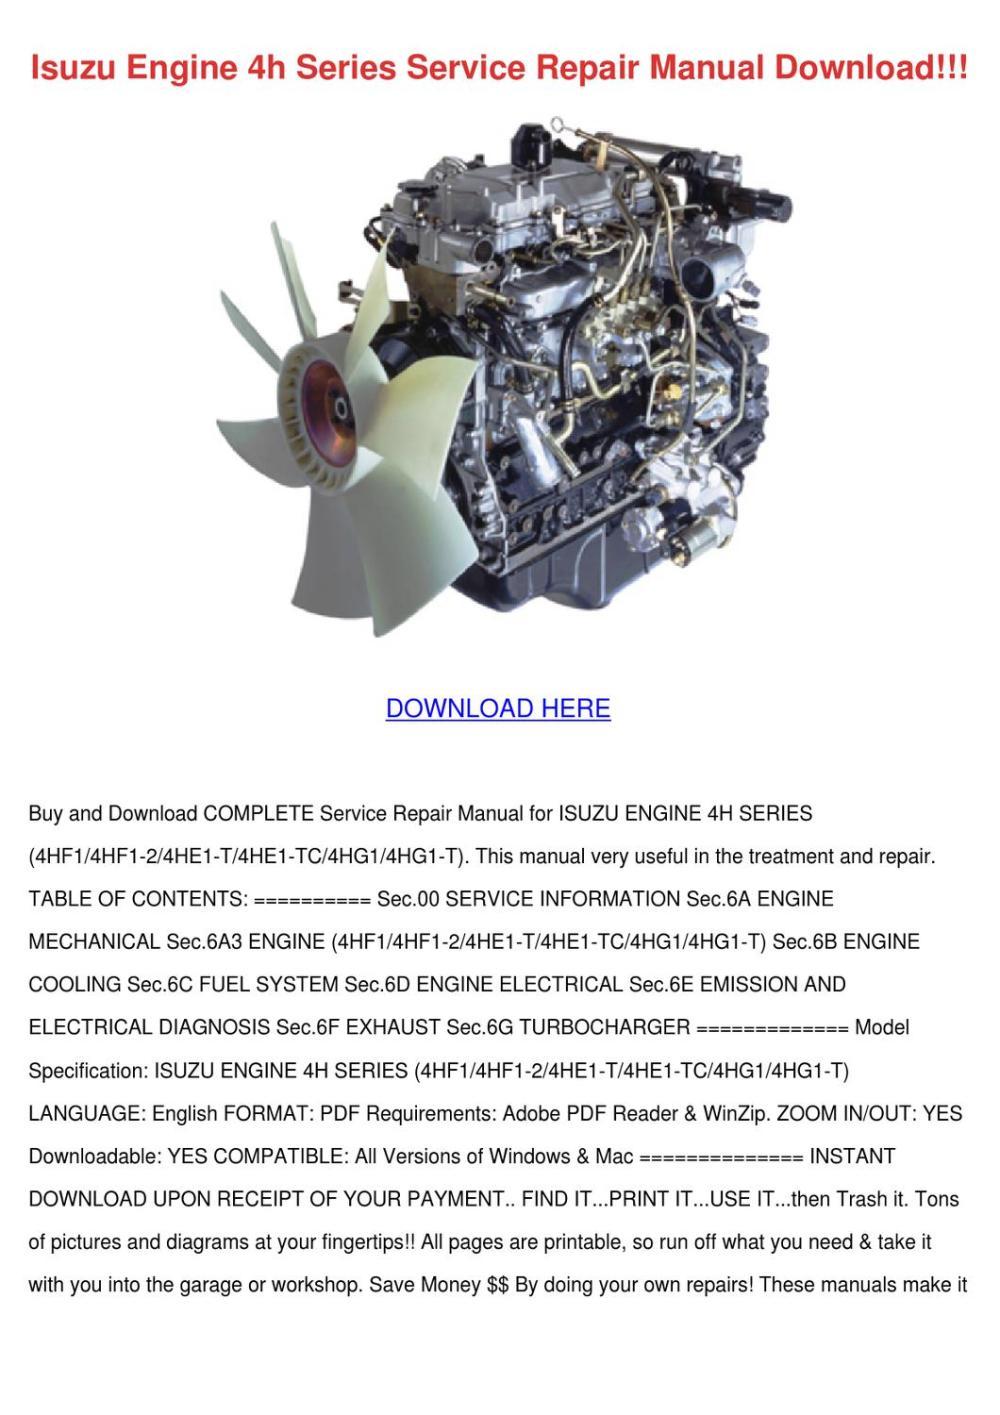 medium resolution of isuzu engine 4h series service repair manual